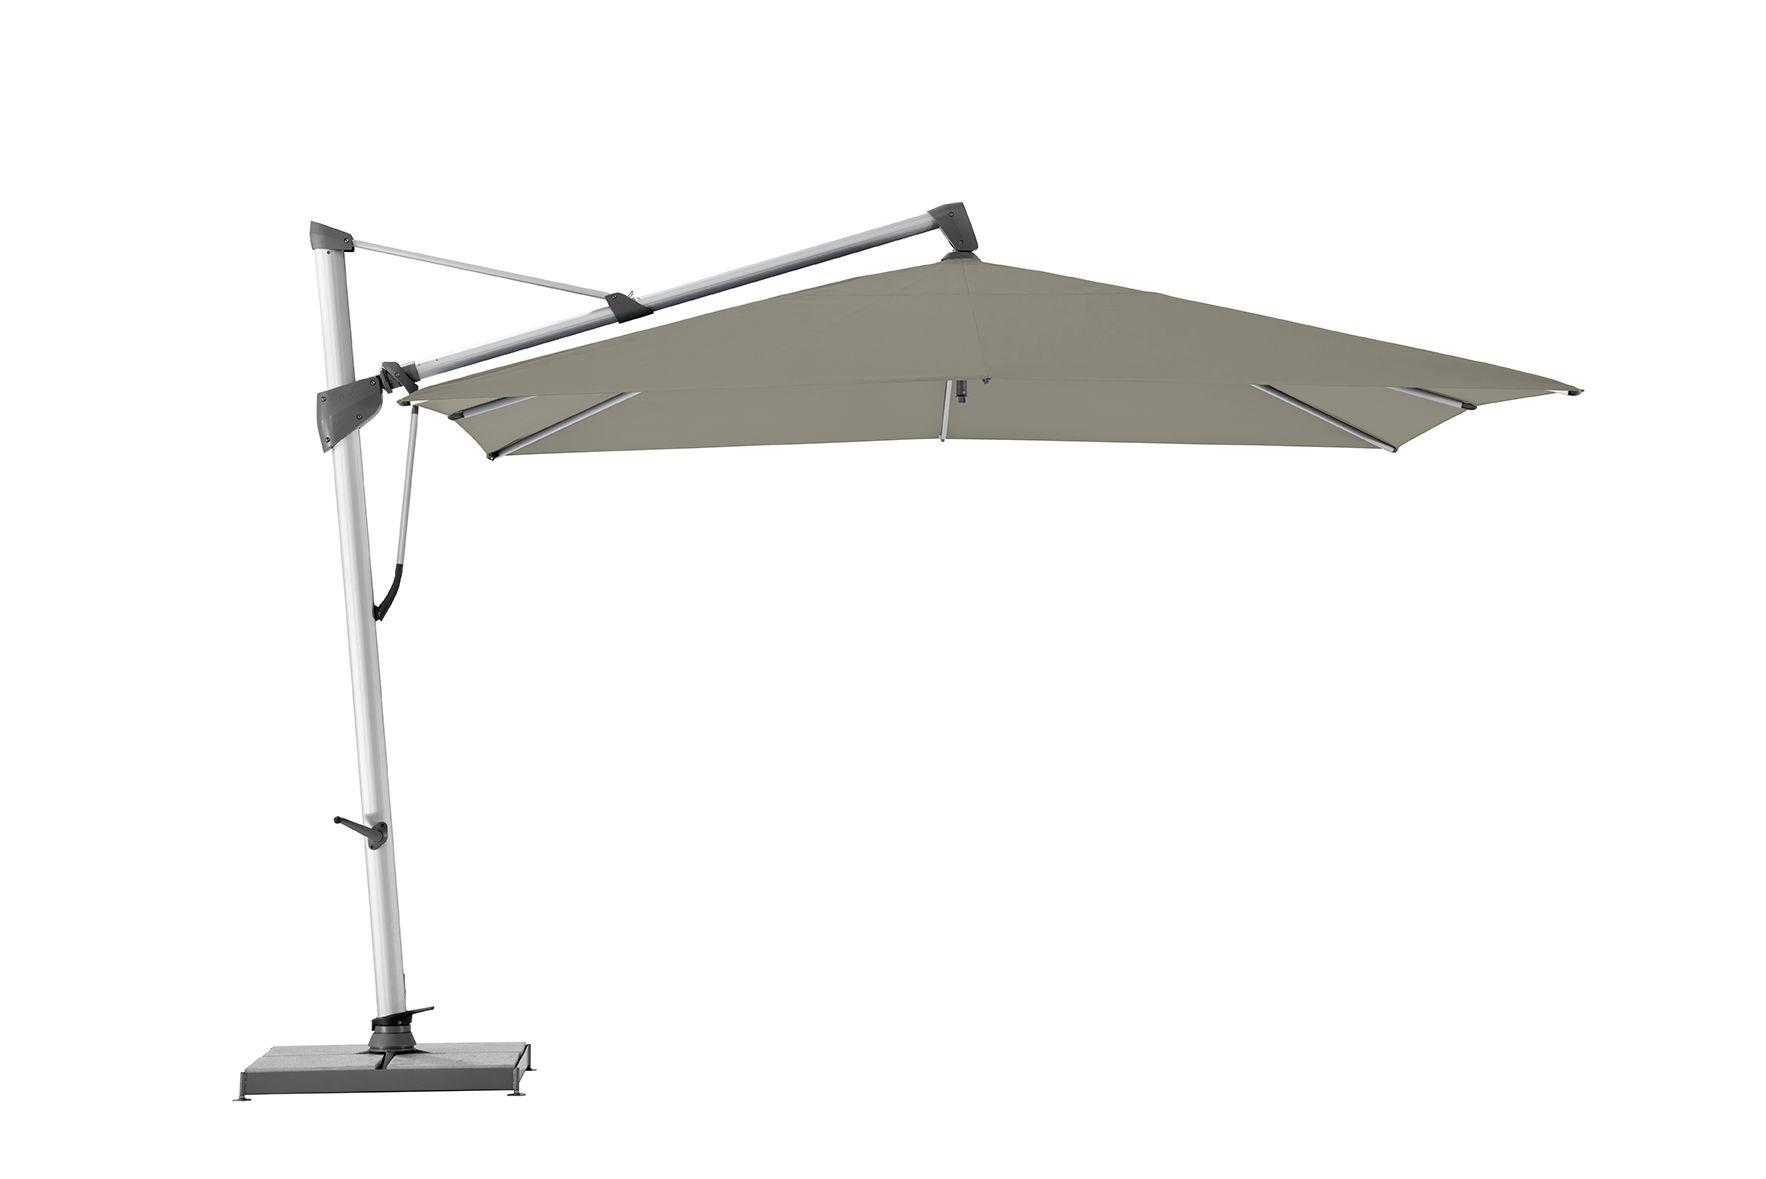 Sombrano S Glatz Specialiste Du Parasol Geant La Qualite Suisse En Plus Parasol Geant Parasol Grand Parasol